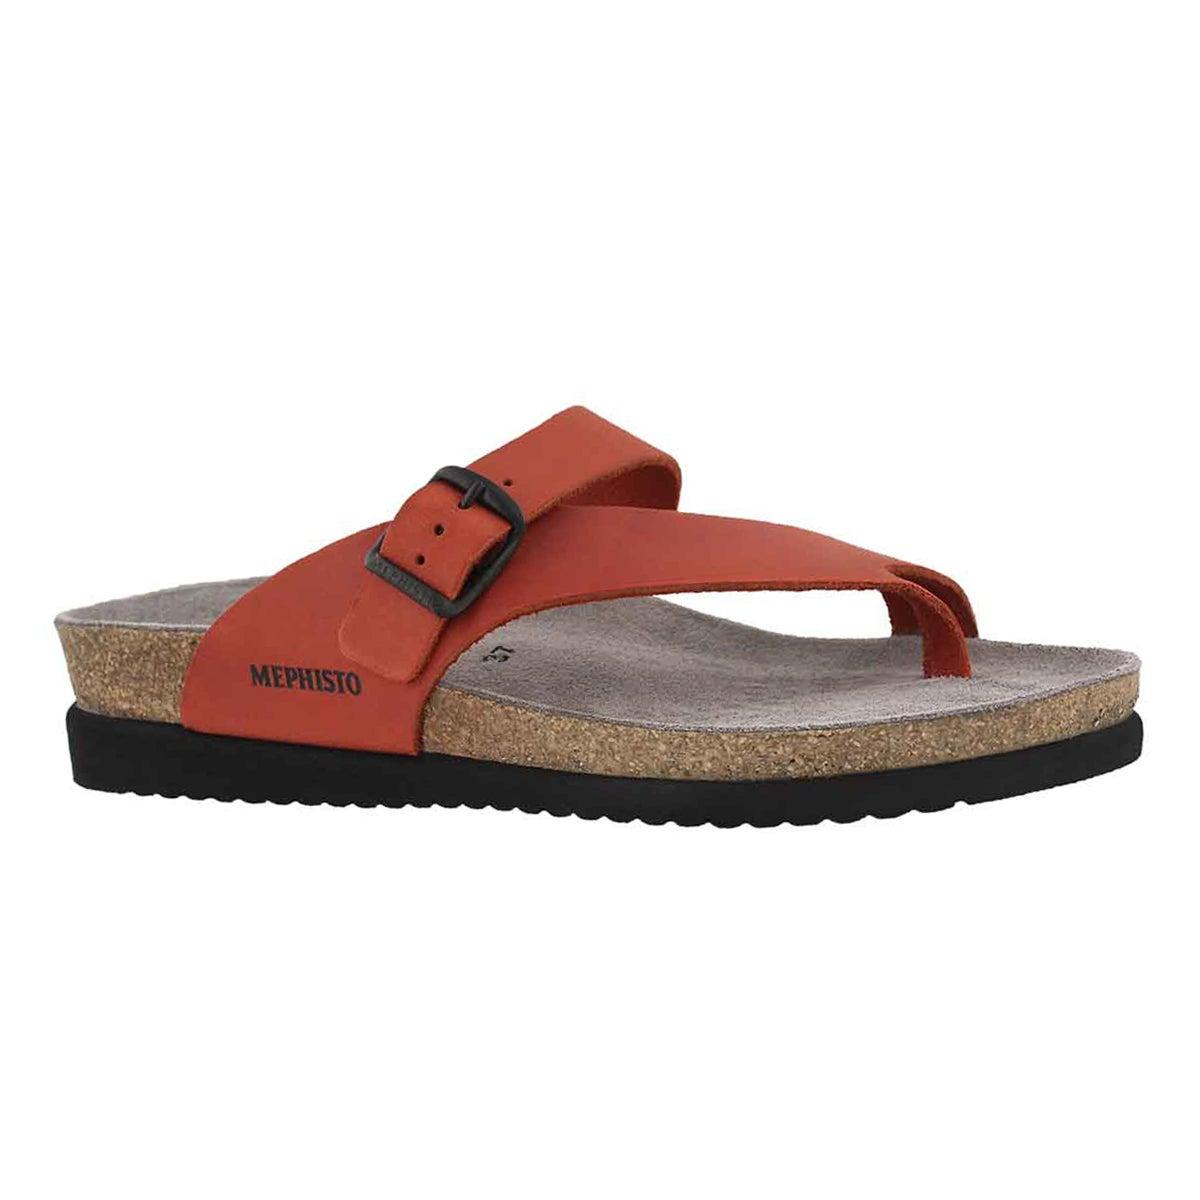 Women's HELEN red scratch cork footbed thongs